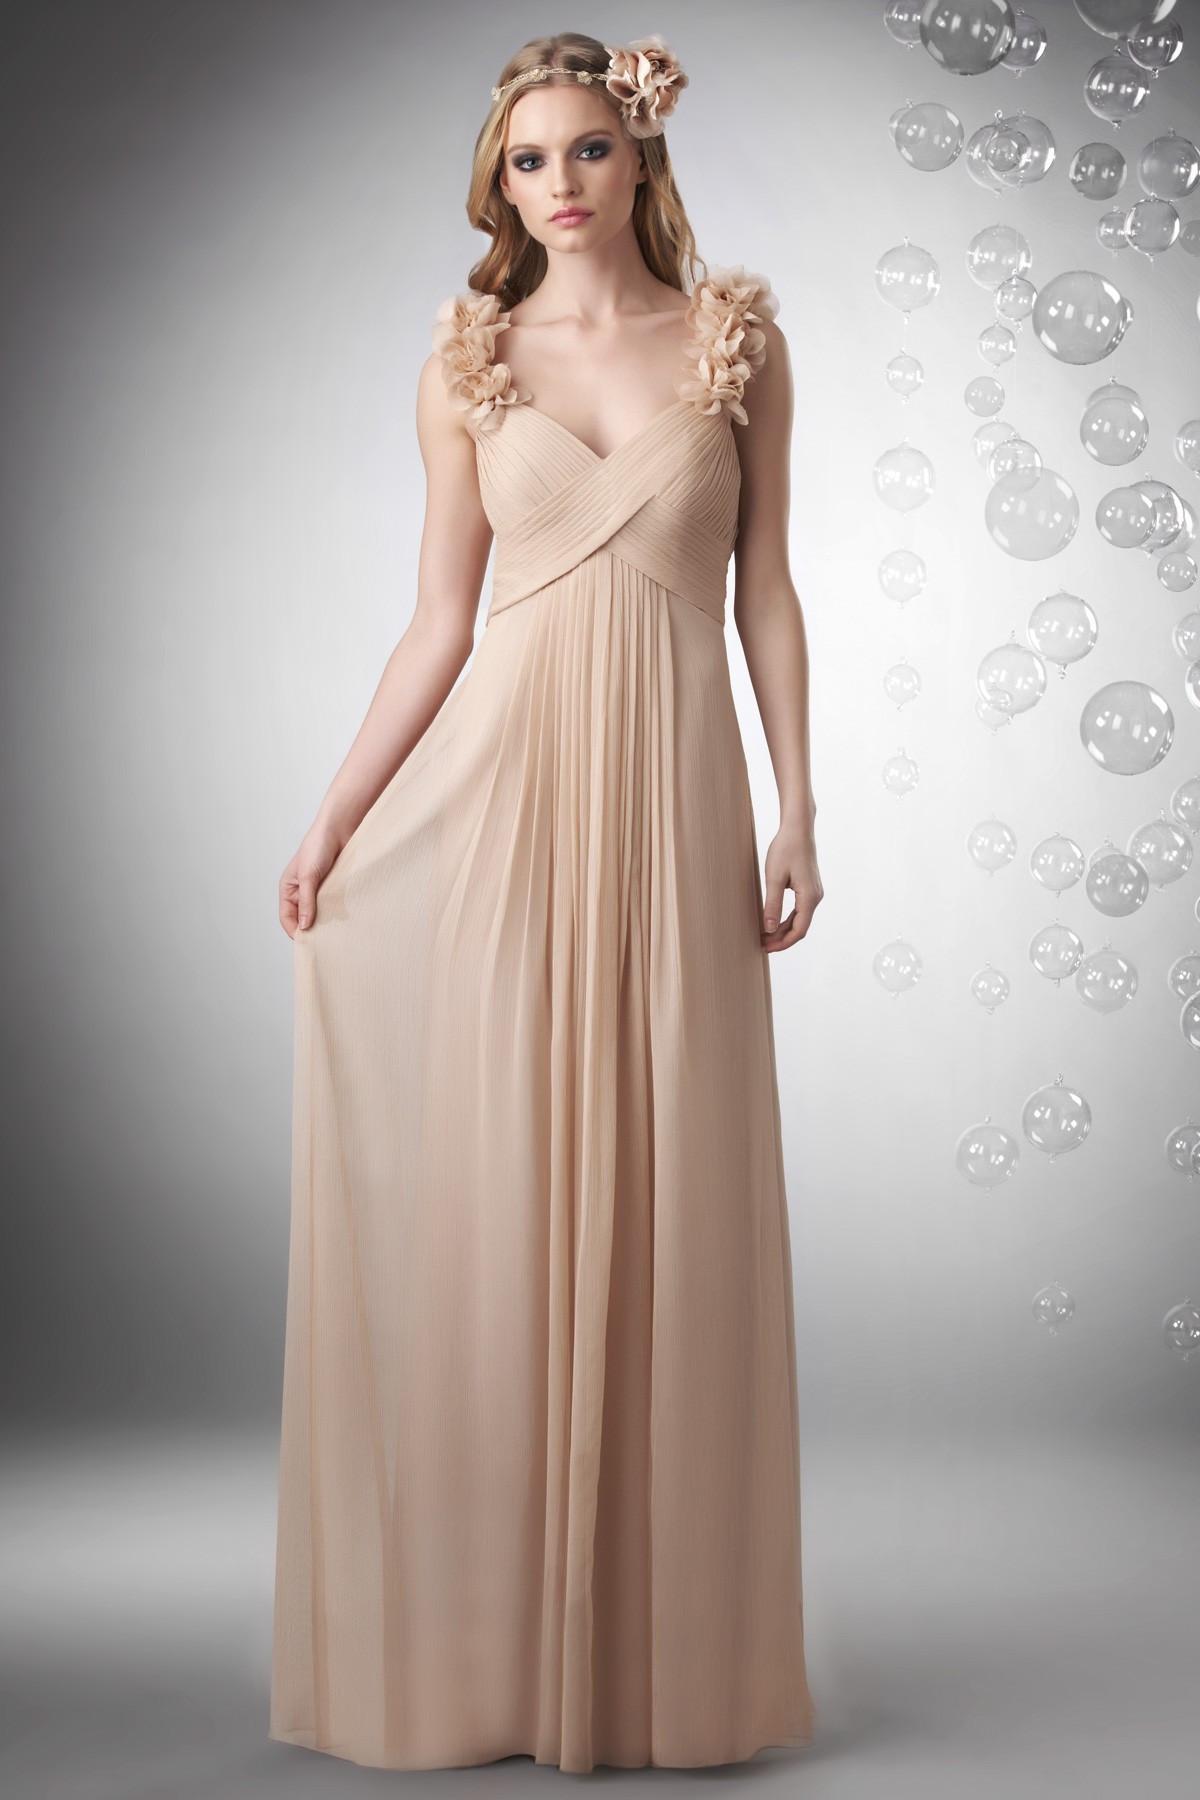 Champagne Wedding Gowns  Champagne Chiffon Dress